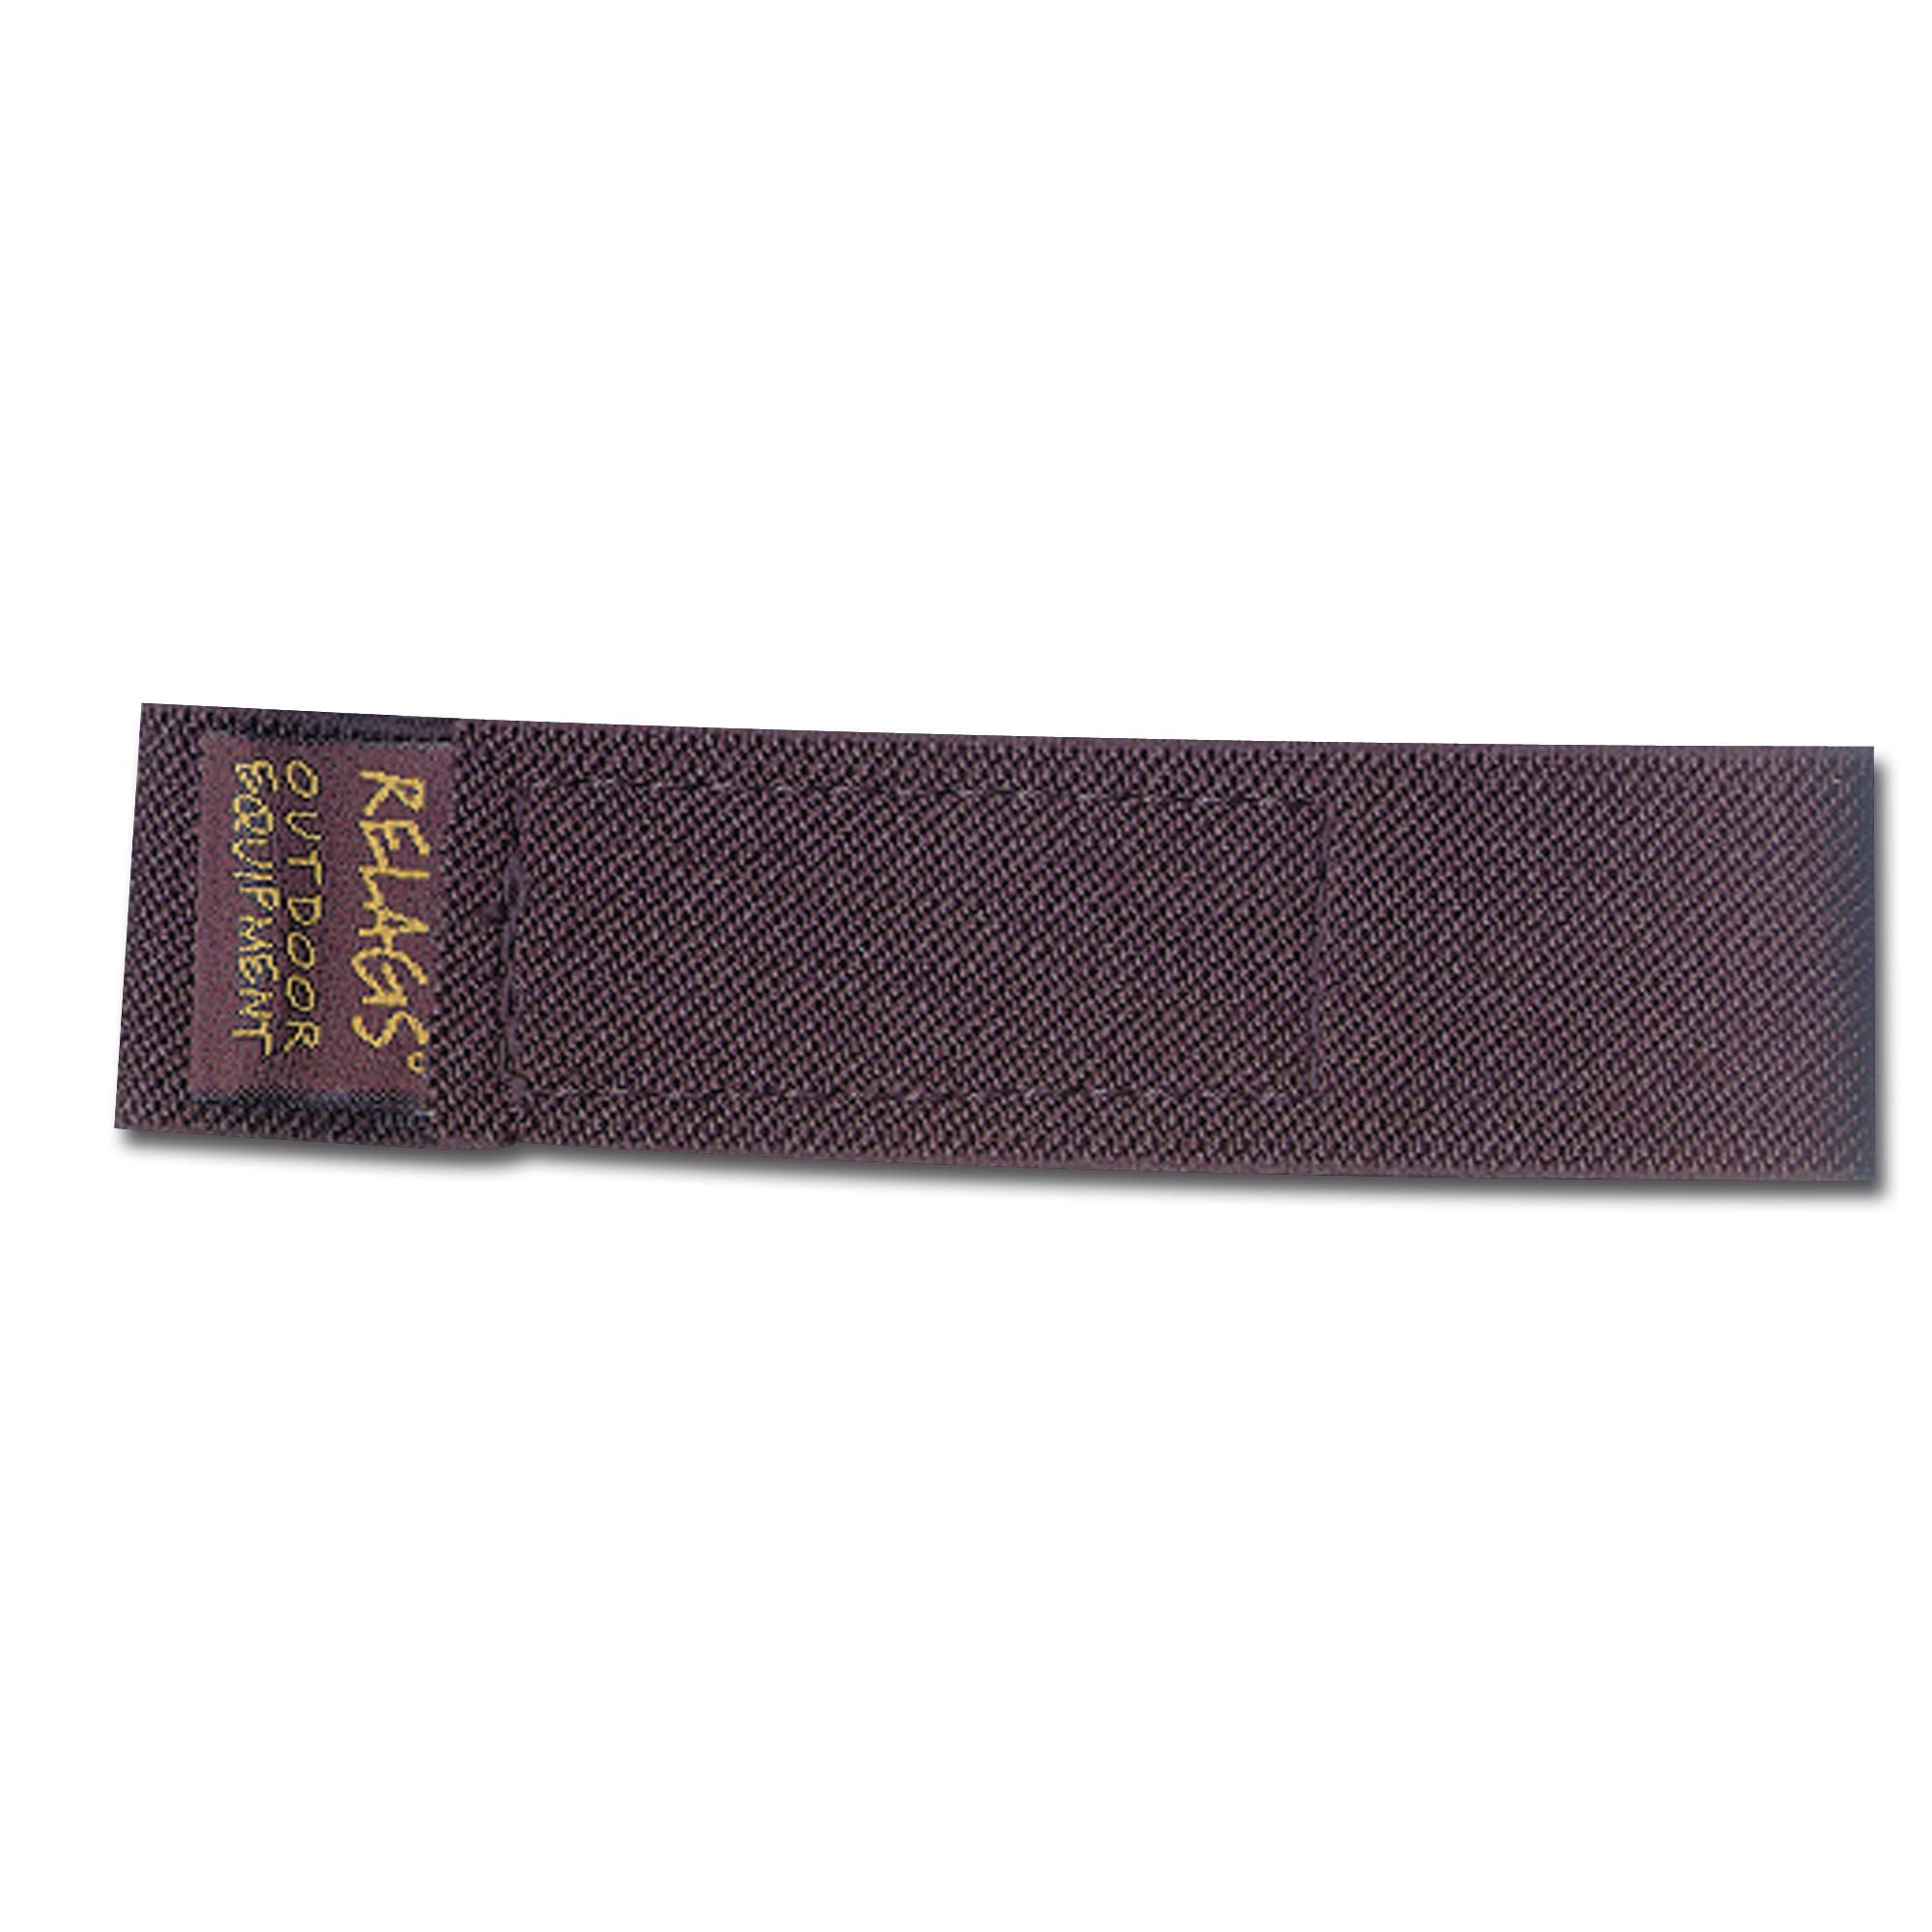 Strapits schwarz 40 cm